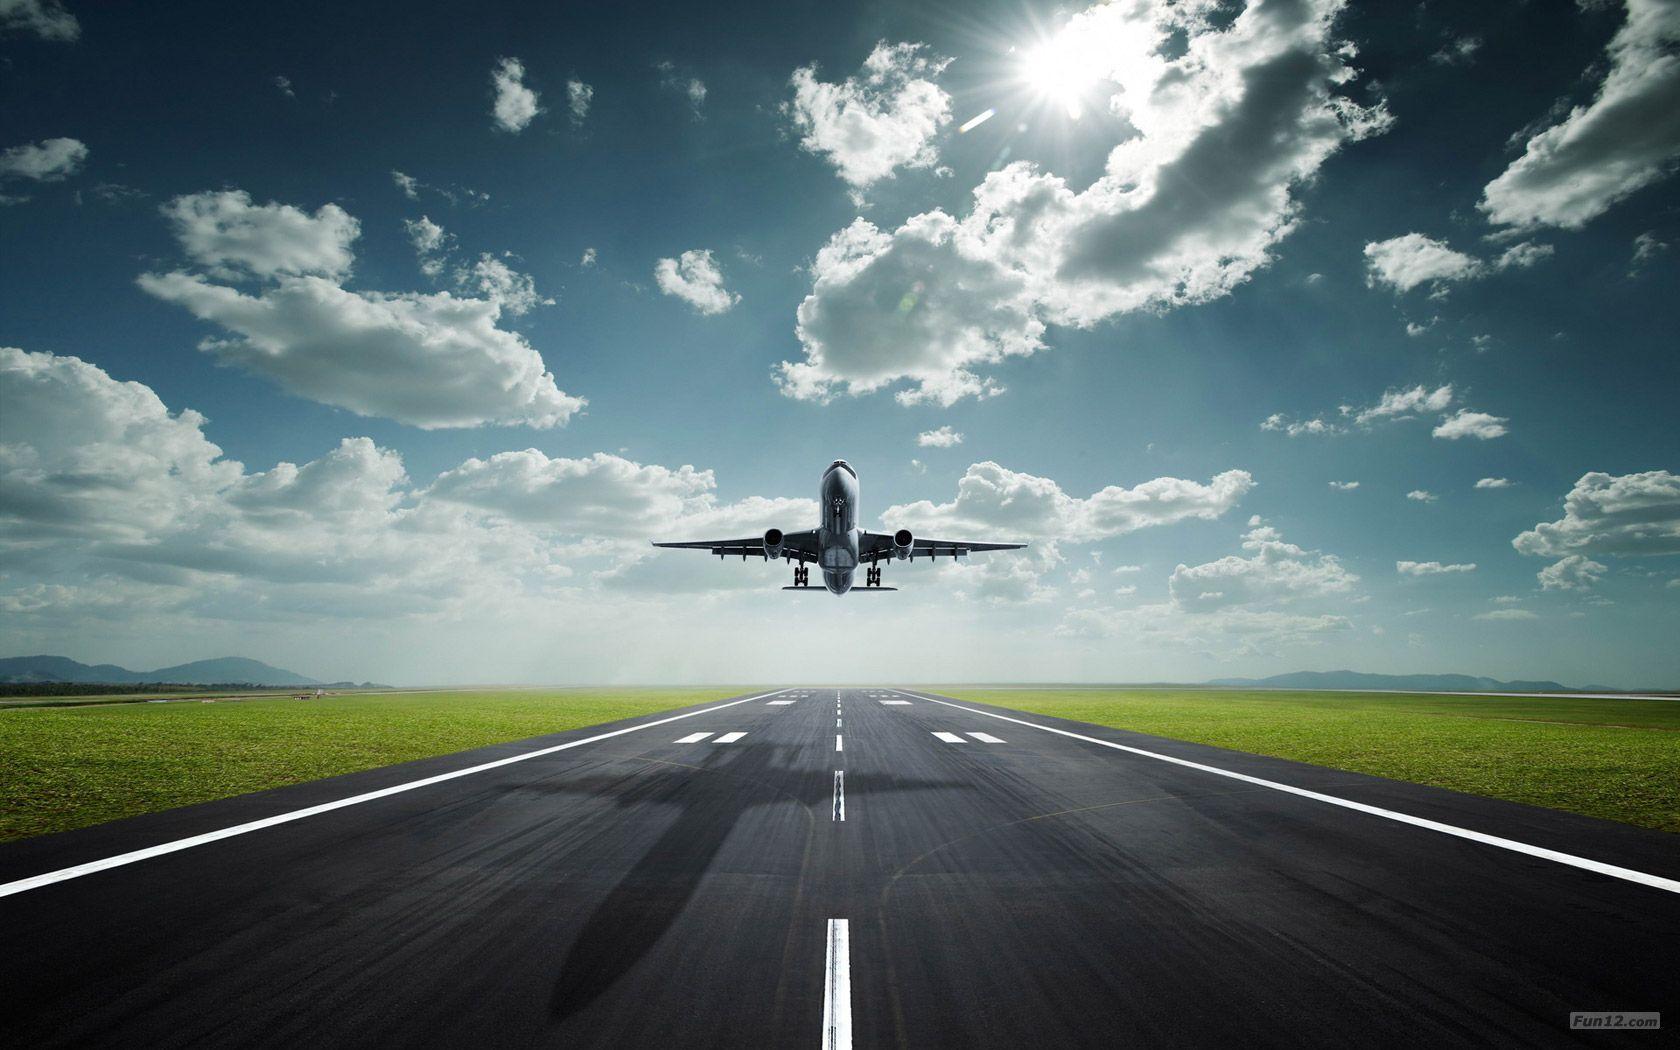 Fond d'écran hd piste avion Fond d'écran avion, Billet